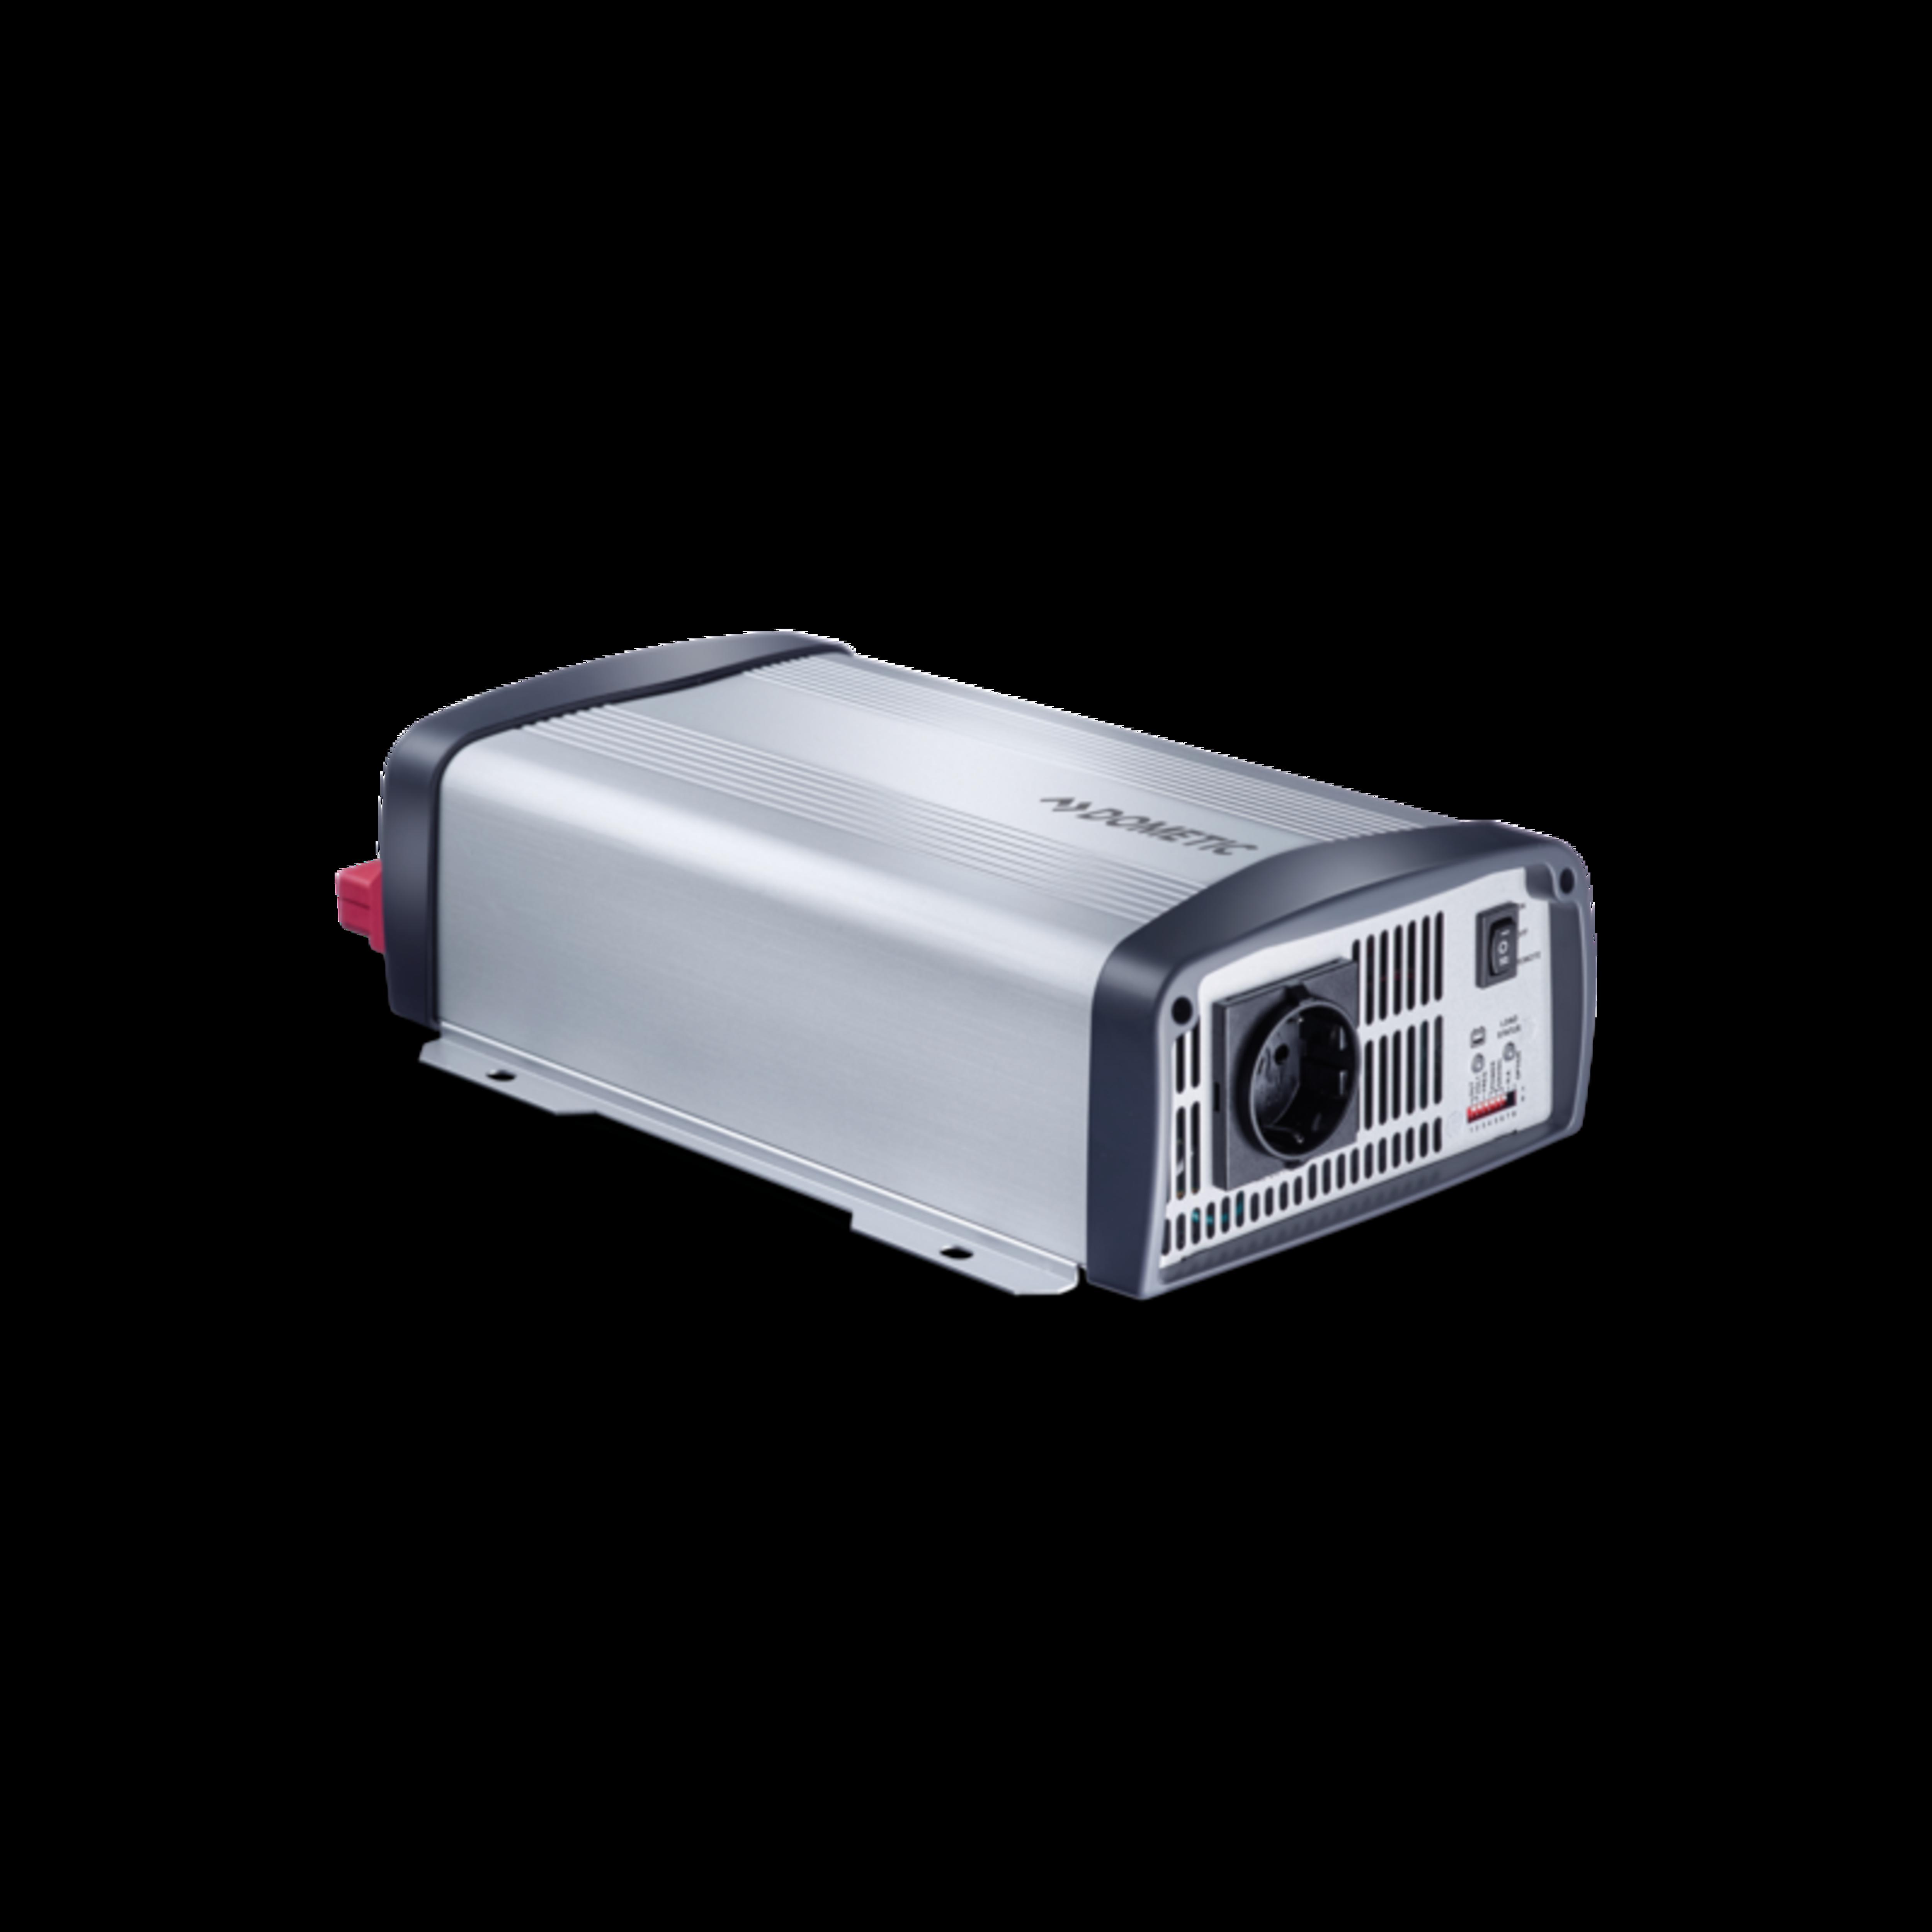 Dometic SinePower MSI 924